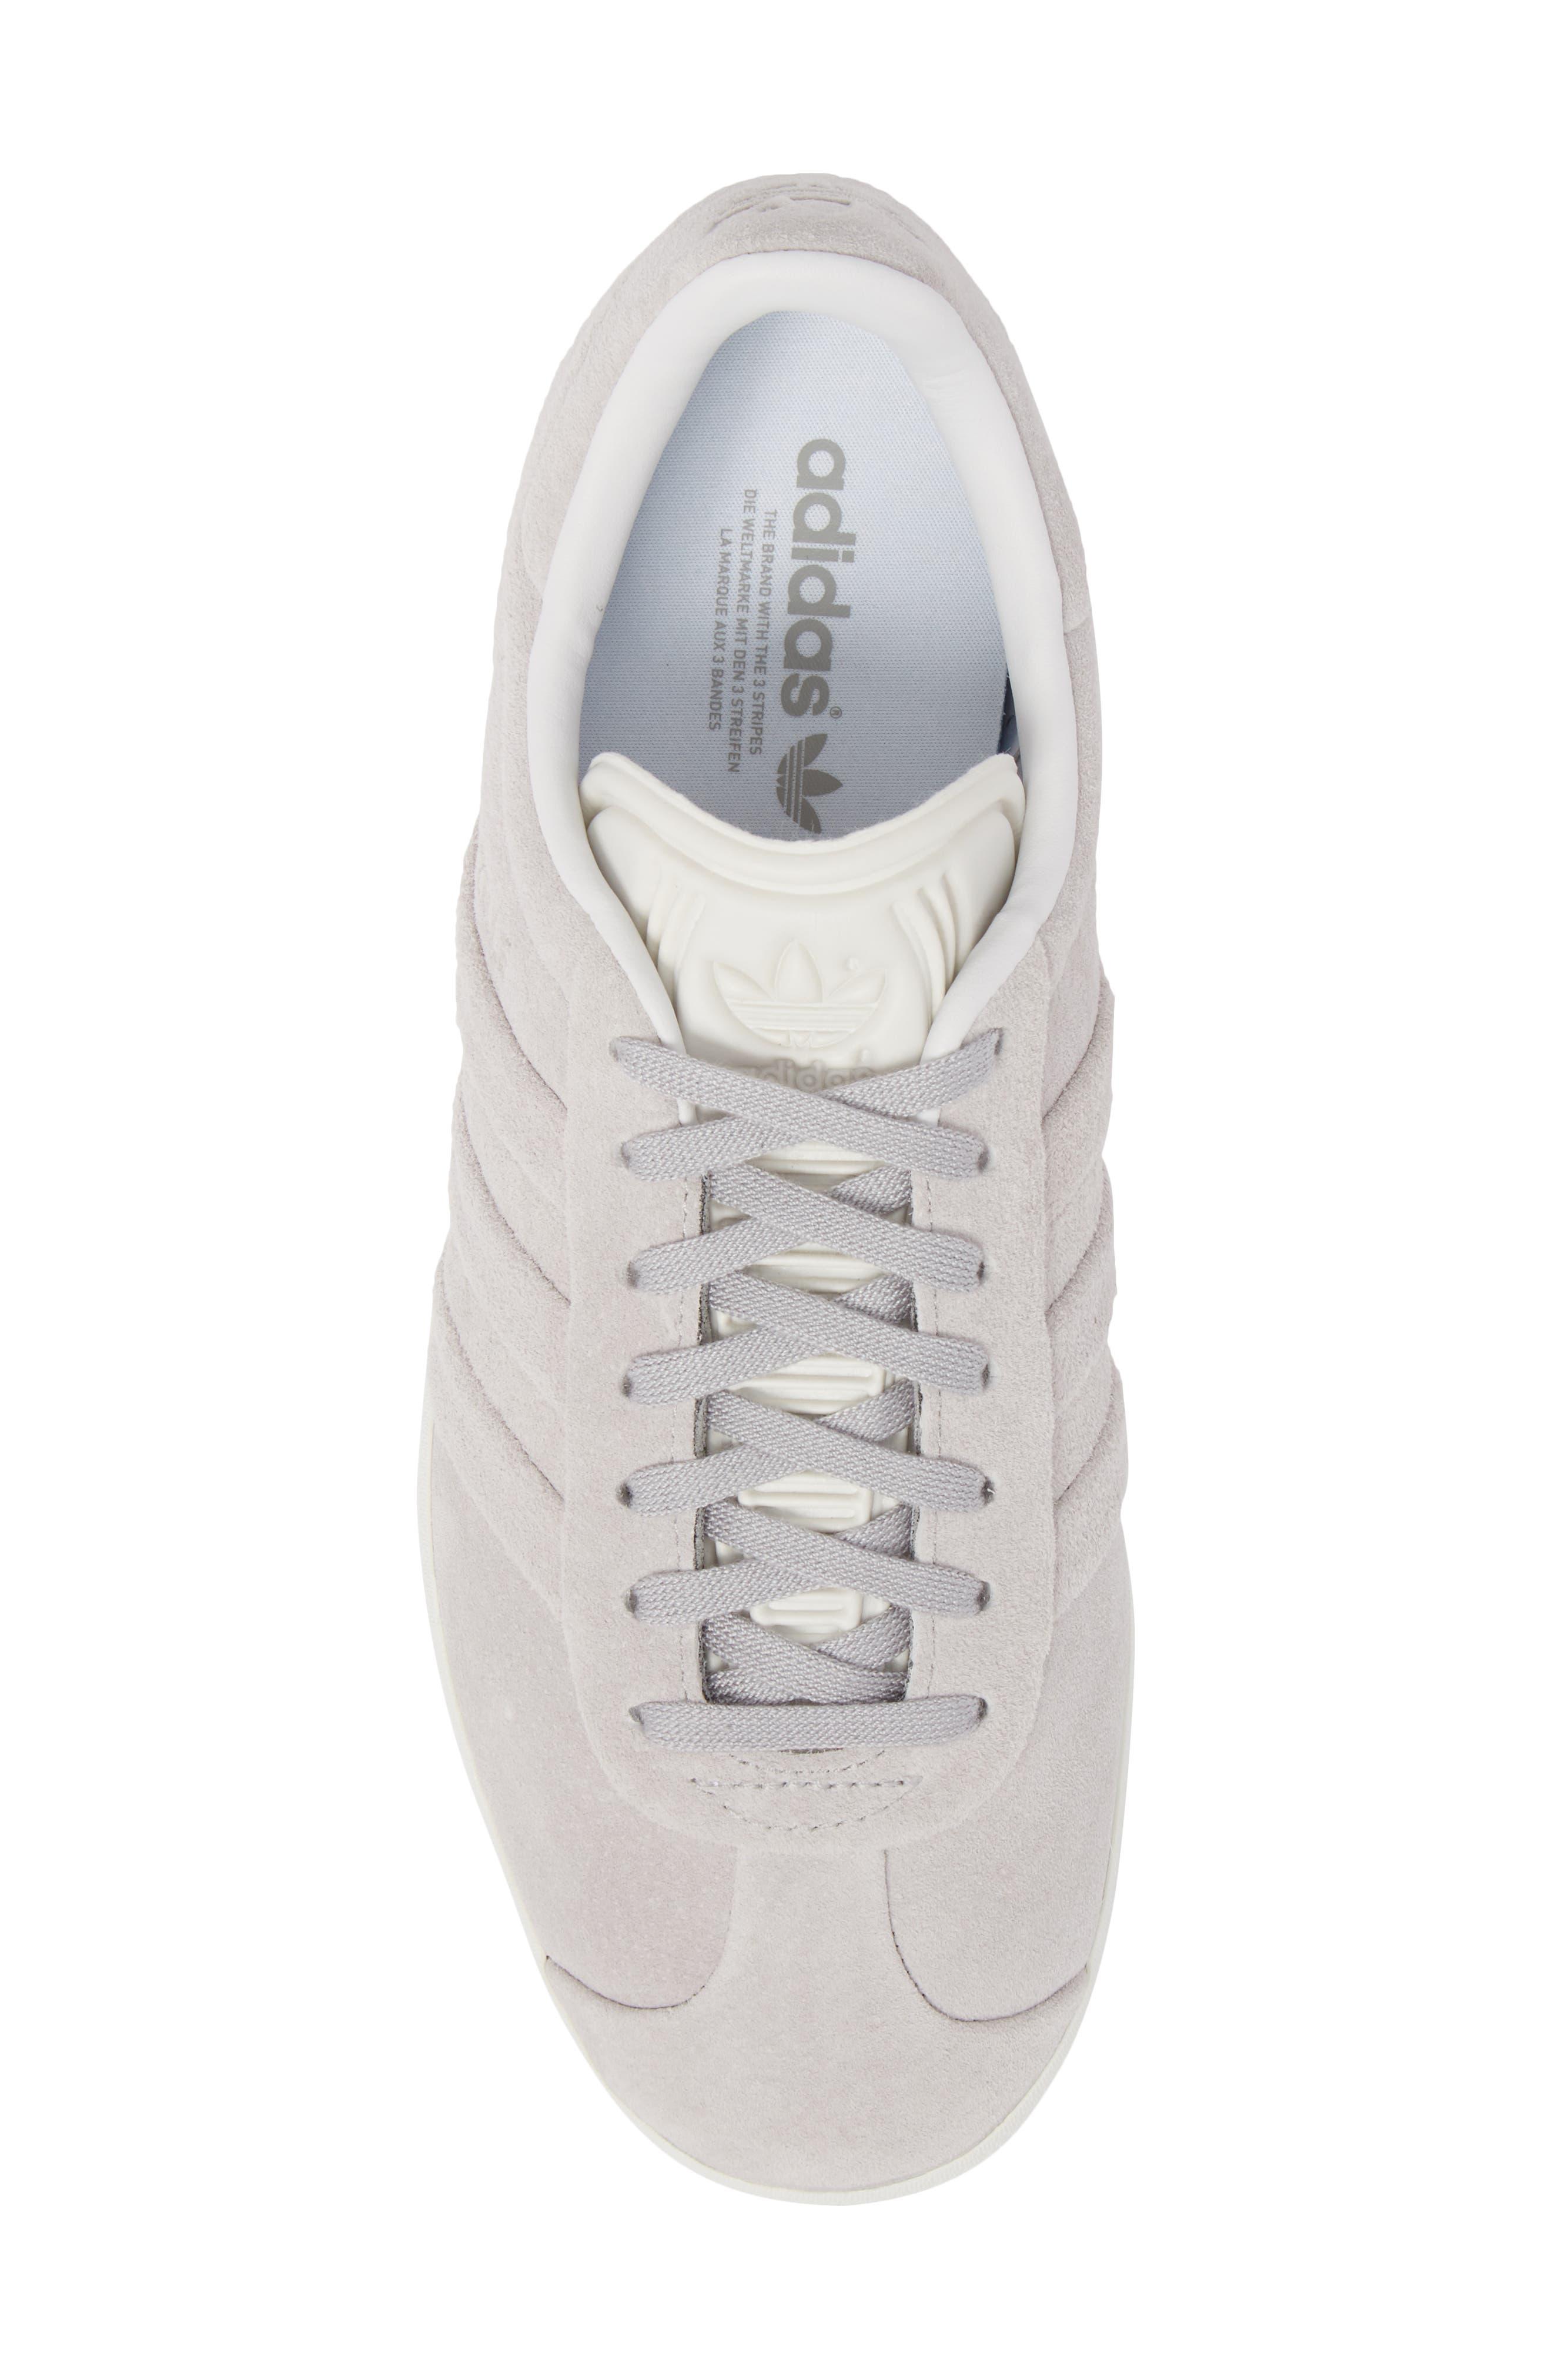 Gazelle Stitch & Turn Sneaker,                             Alternate thumbnail 5, color,                             GREY/ GREY/ WHITE